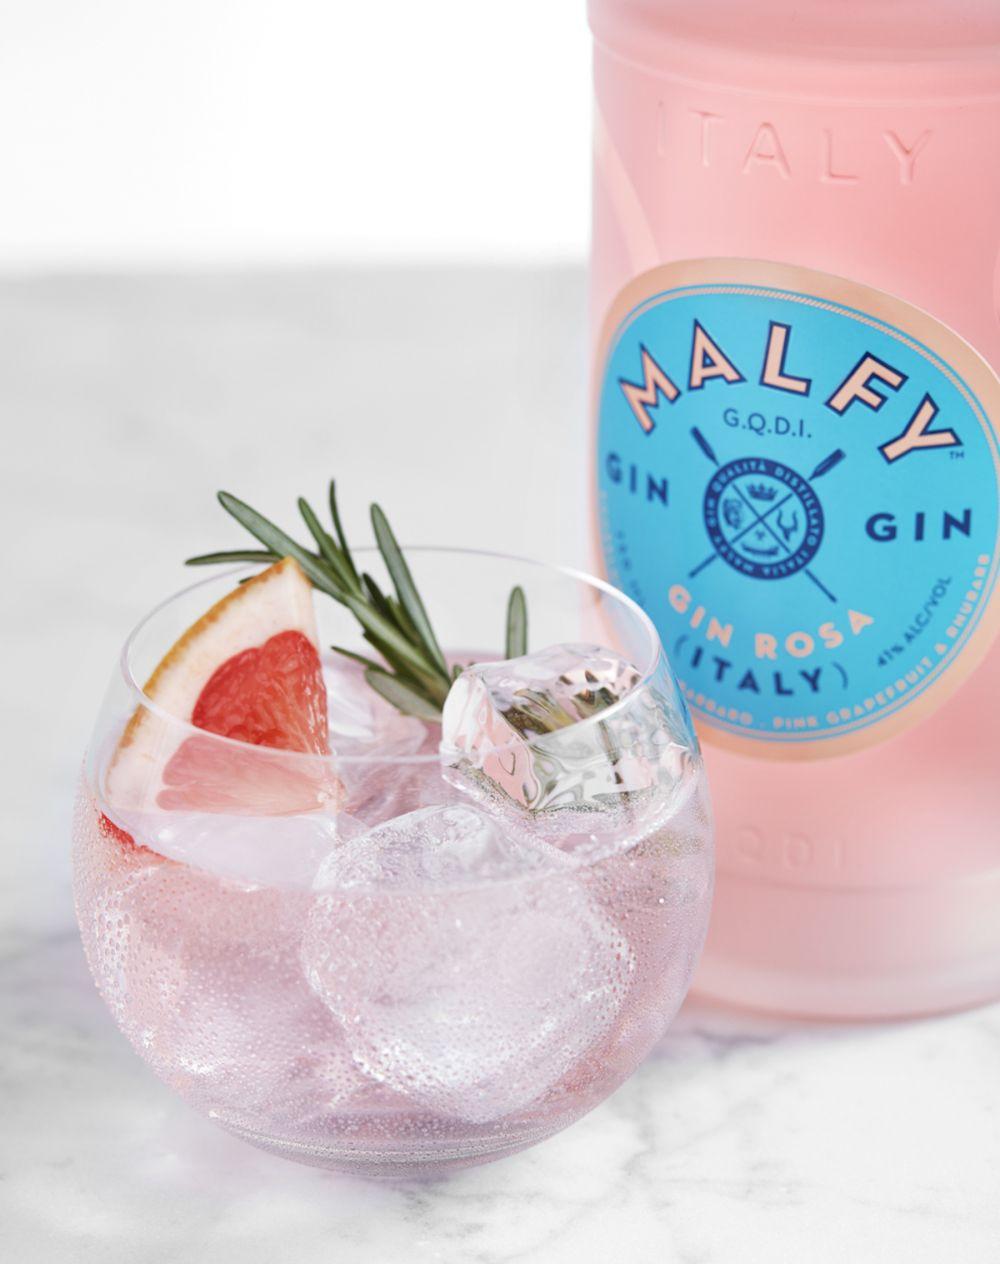 Rosa Gin & Tonic